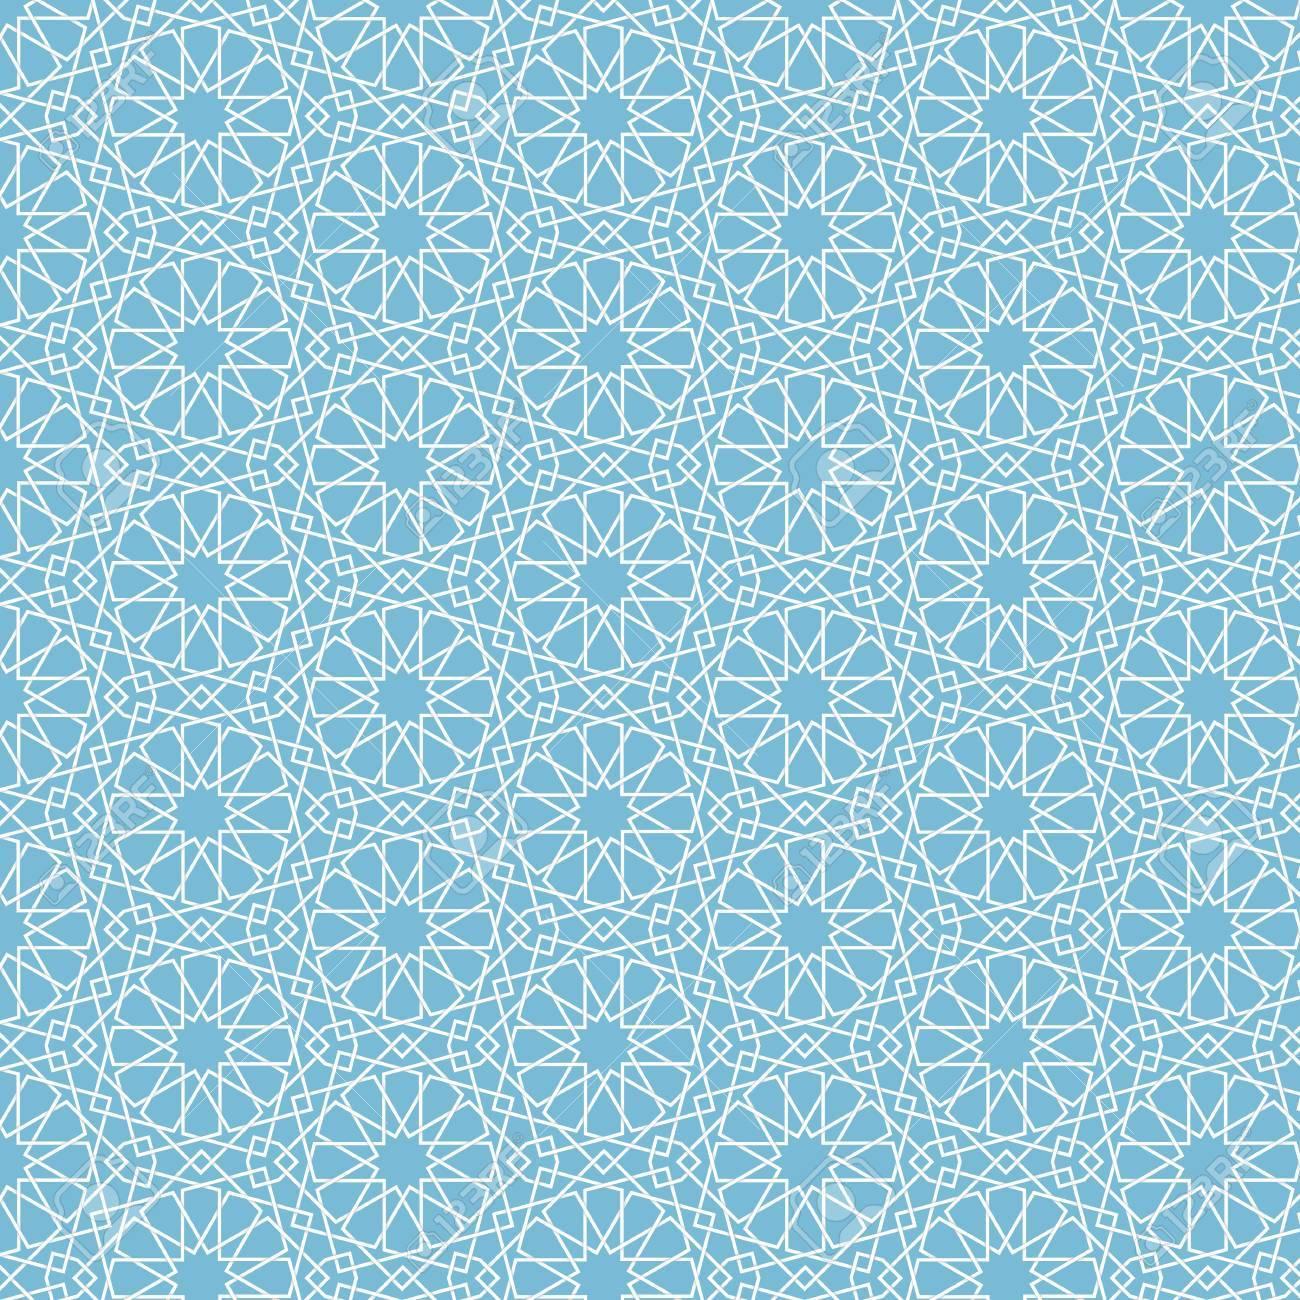 Vector Abstract Geometric Islamic Background Based On Ethnic